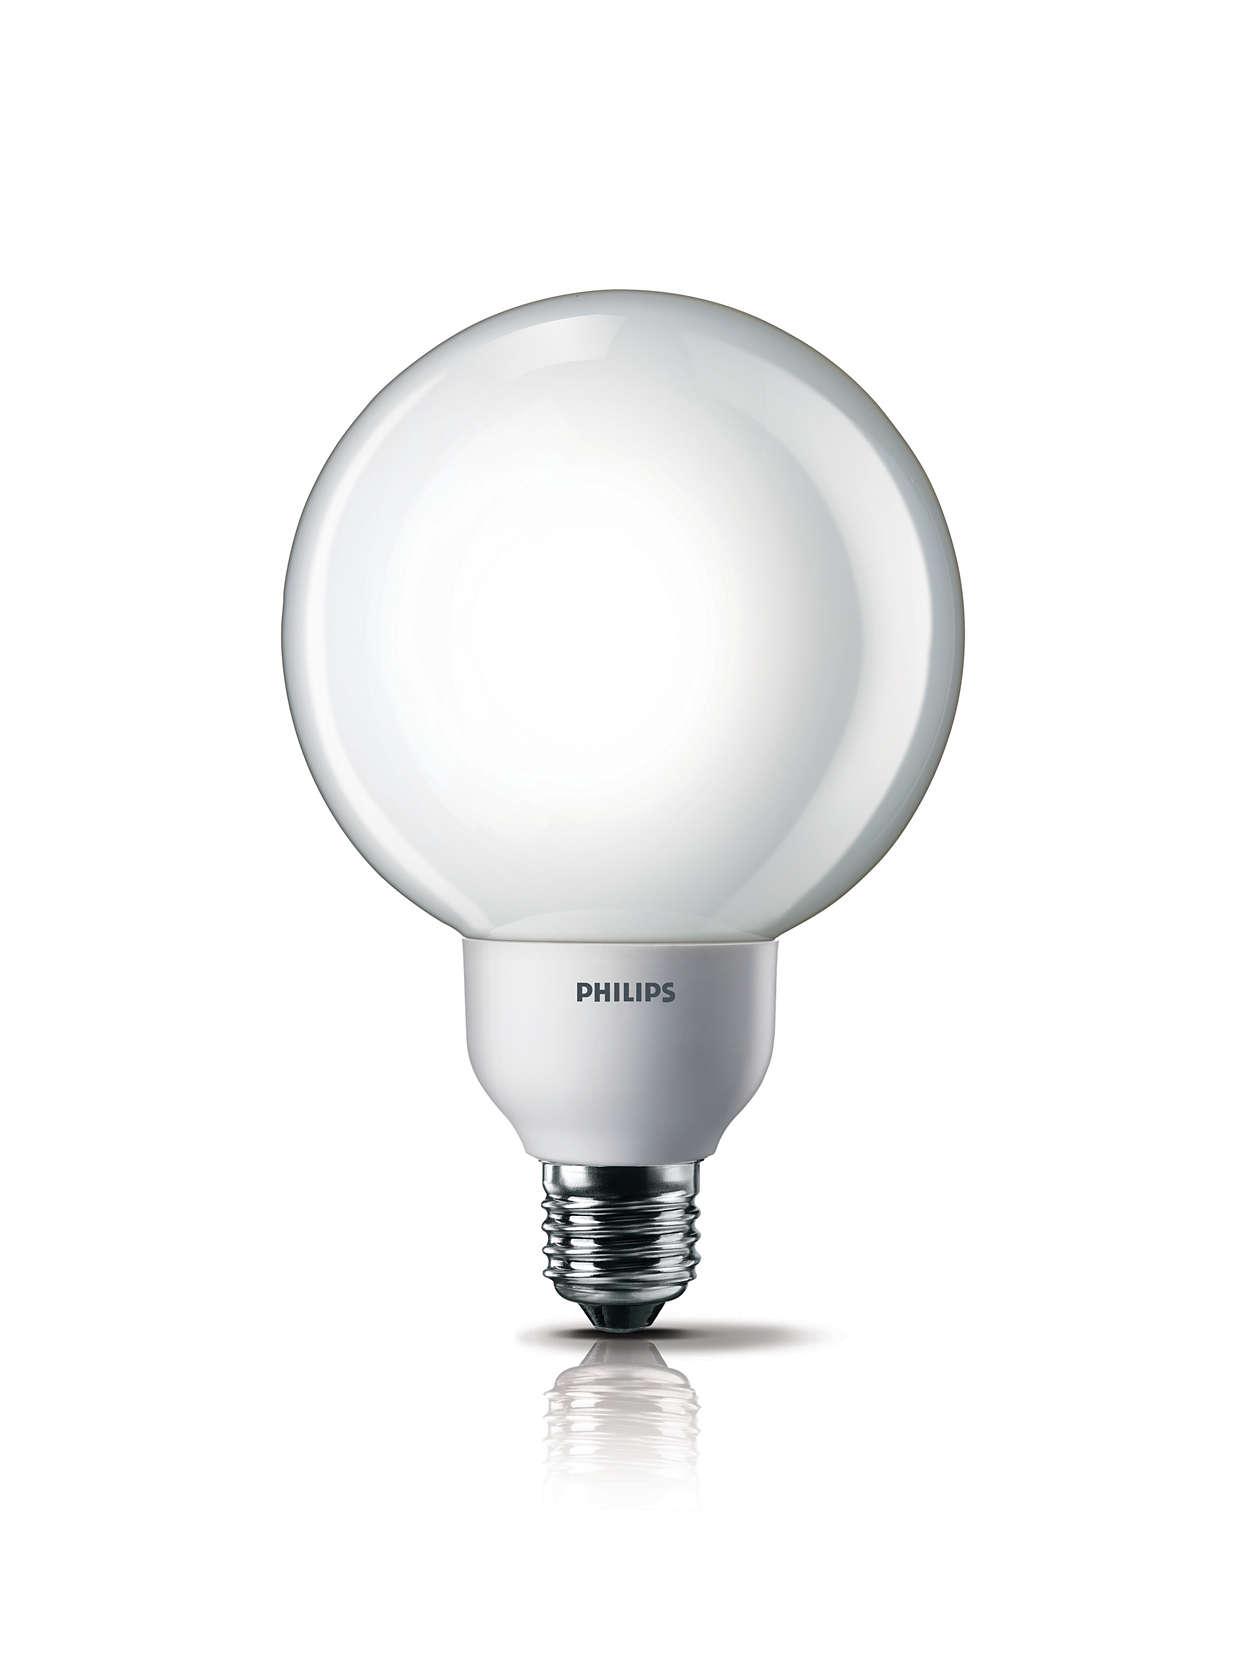 Energy-saving bulb in a classic shape